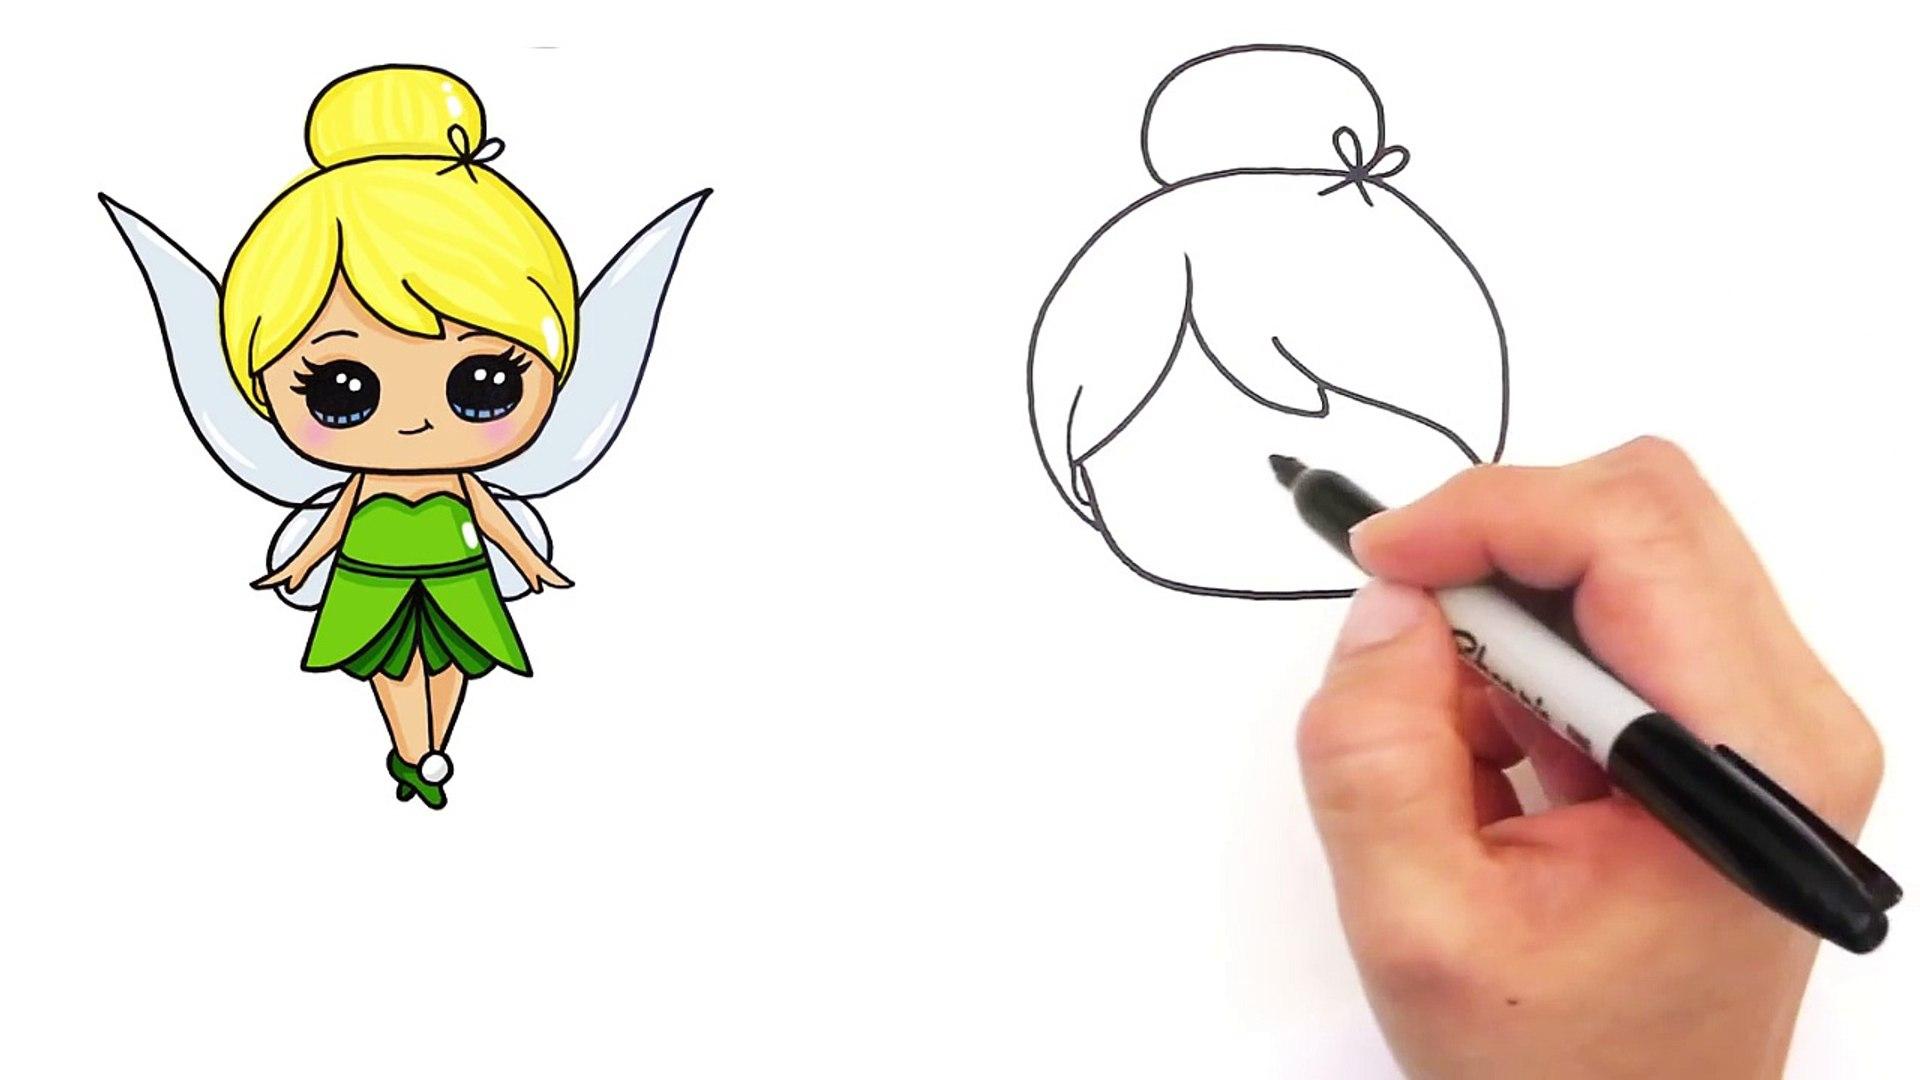 Arte Campana Por Lindo Sorteo Dibujos Hada Flor Cómo Paso Gitano Para Disney Fun2draw